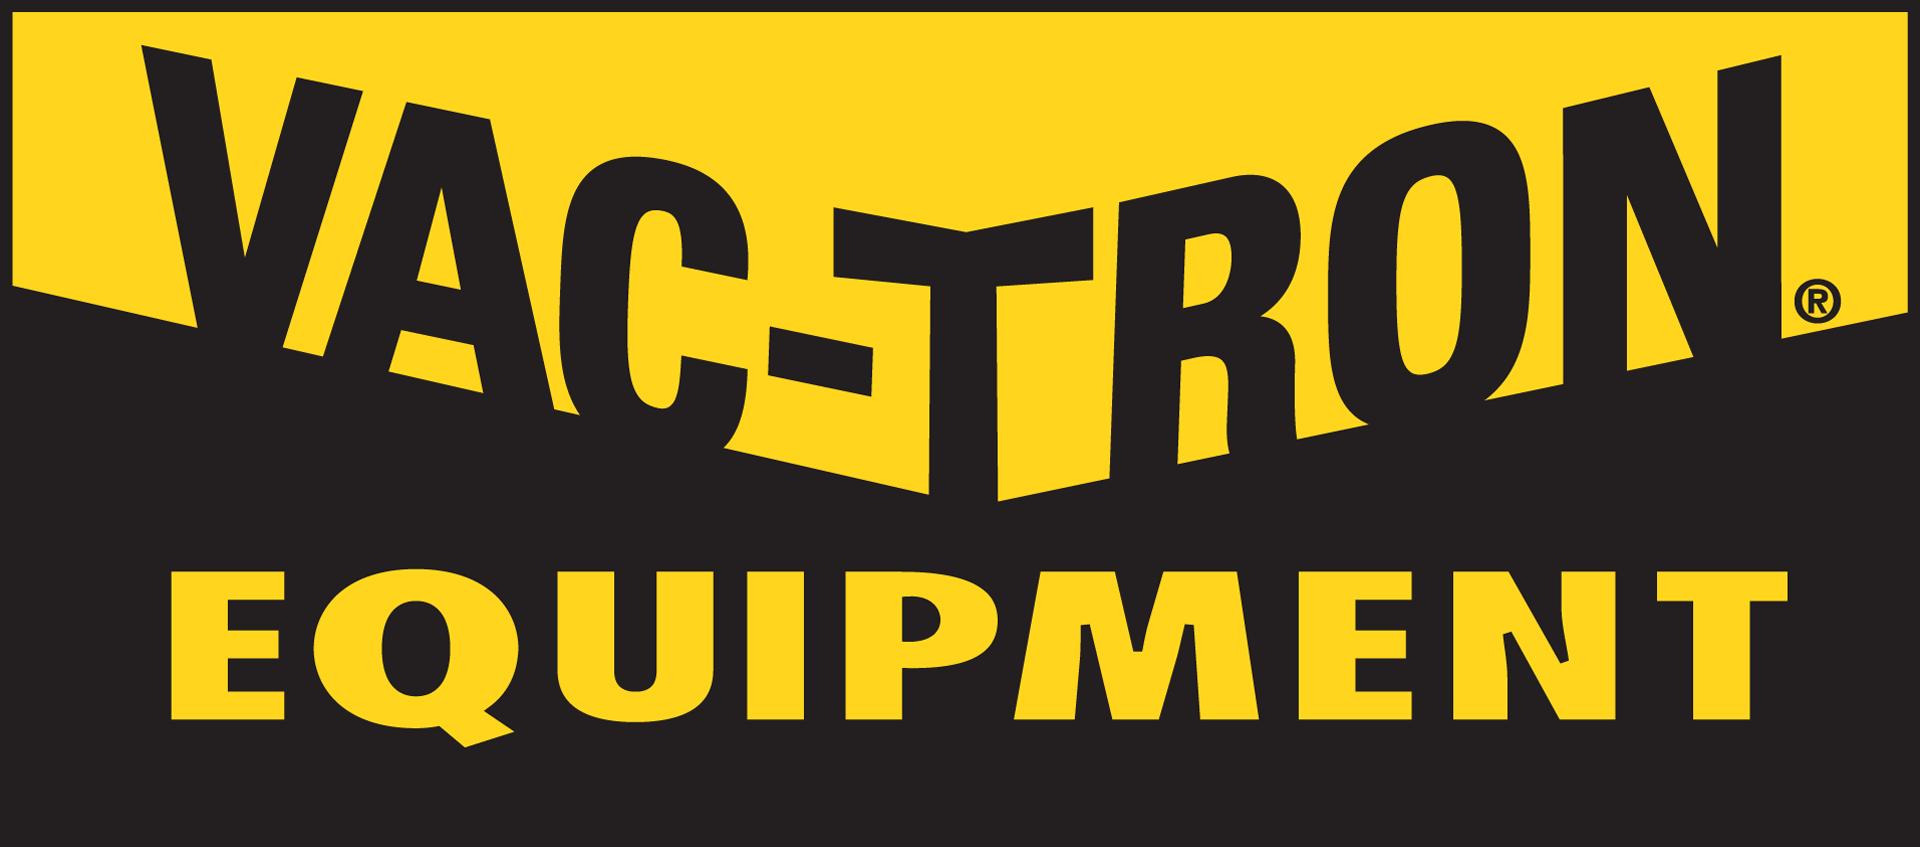 Vac-Tron Logo.png